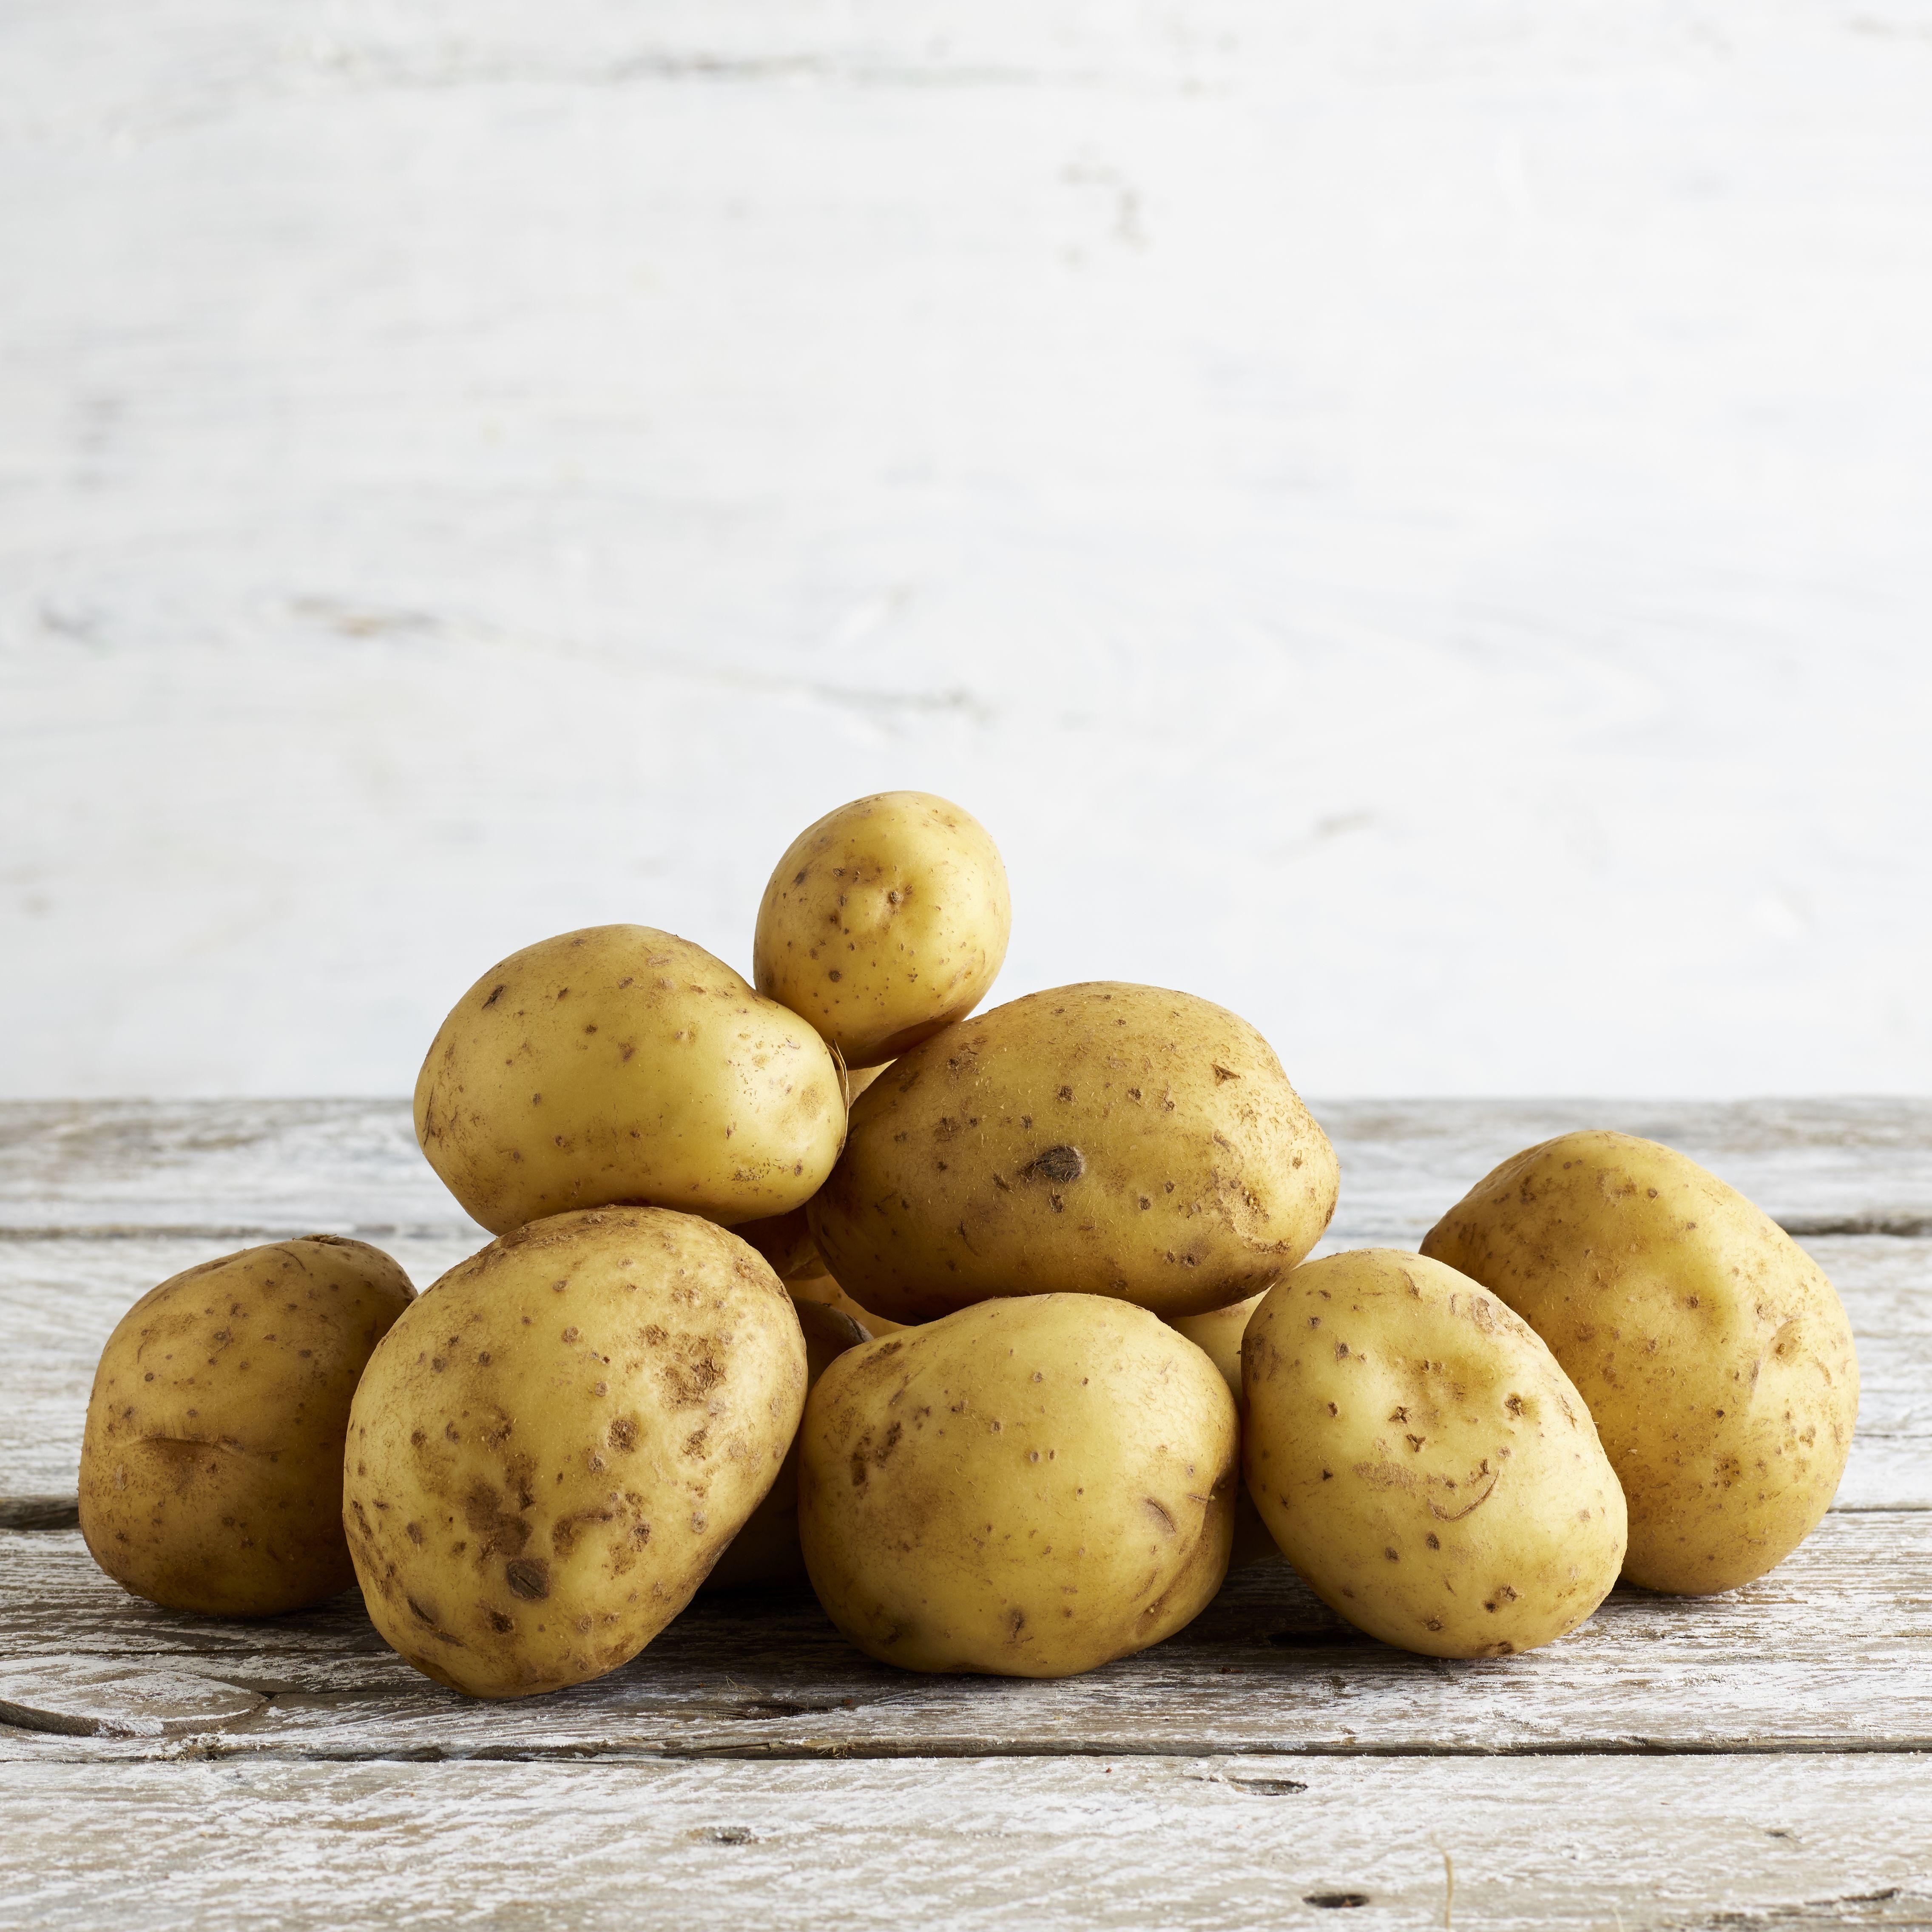 Standard White Potatoes, 2kg